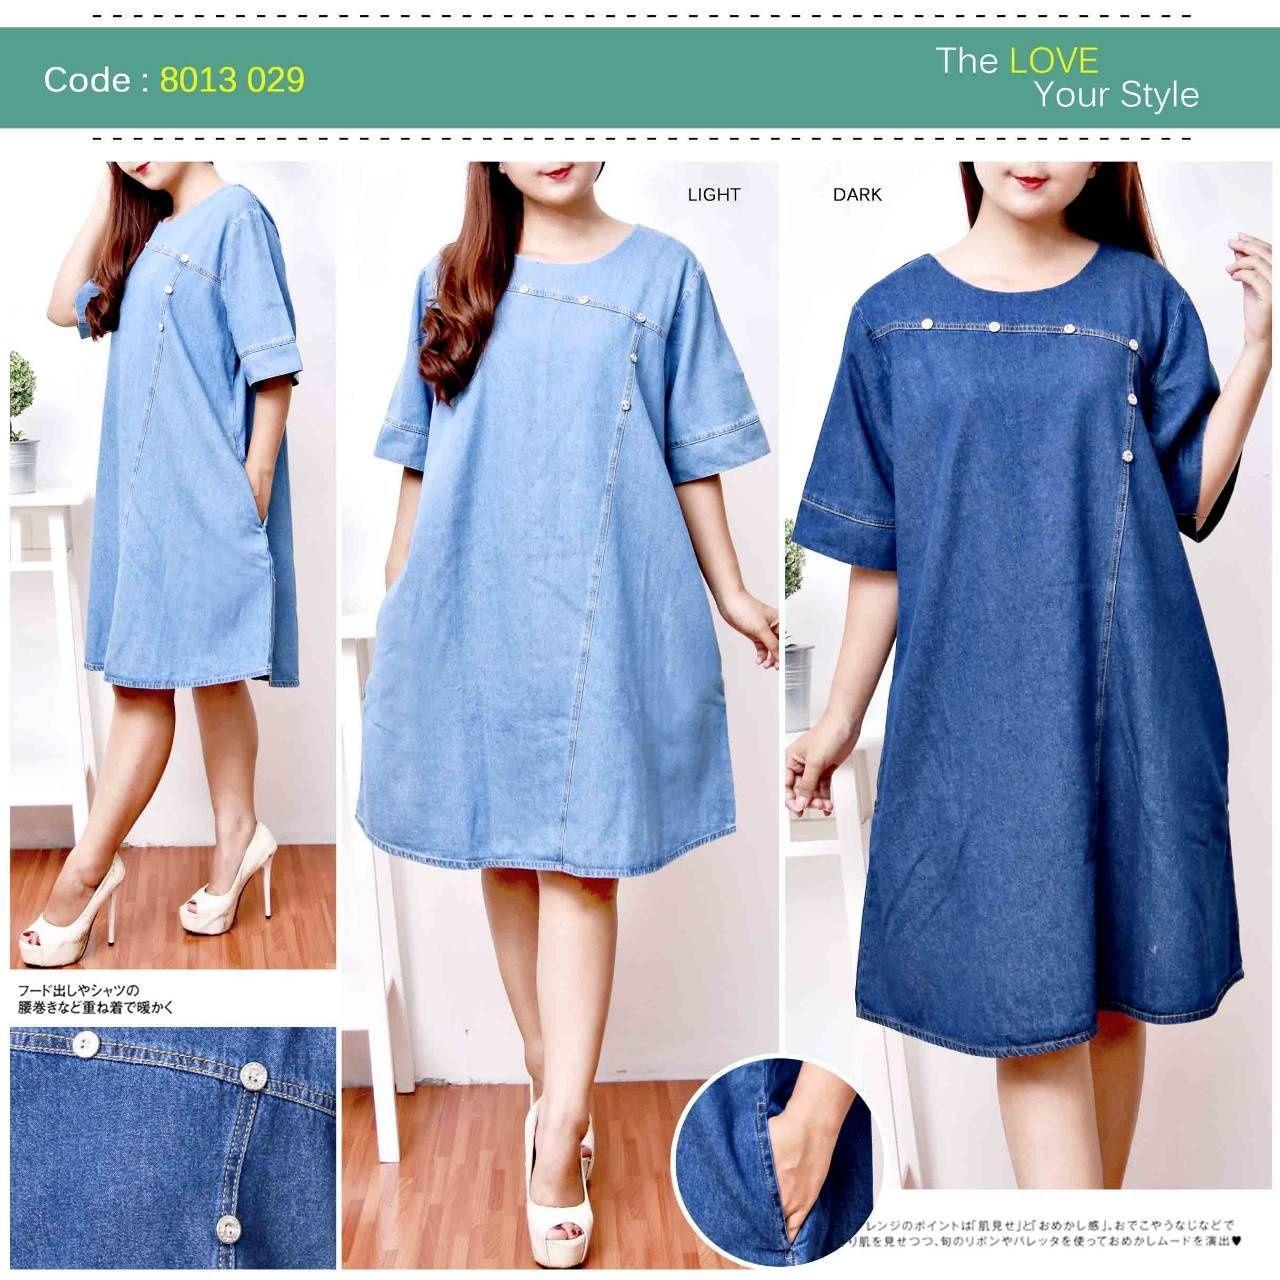 D.N.Y.H Shop CODE 3029 JEANS JUMBO / Baju Muslim / Kemeja Dress / Tunik / Atasan Wanita / Dress Wan